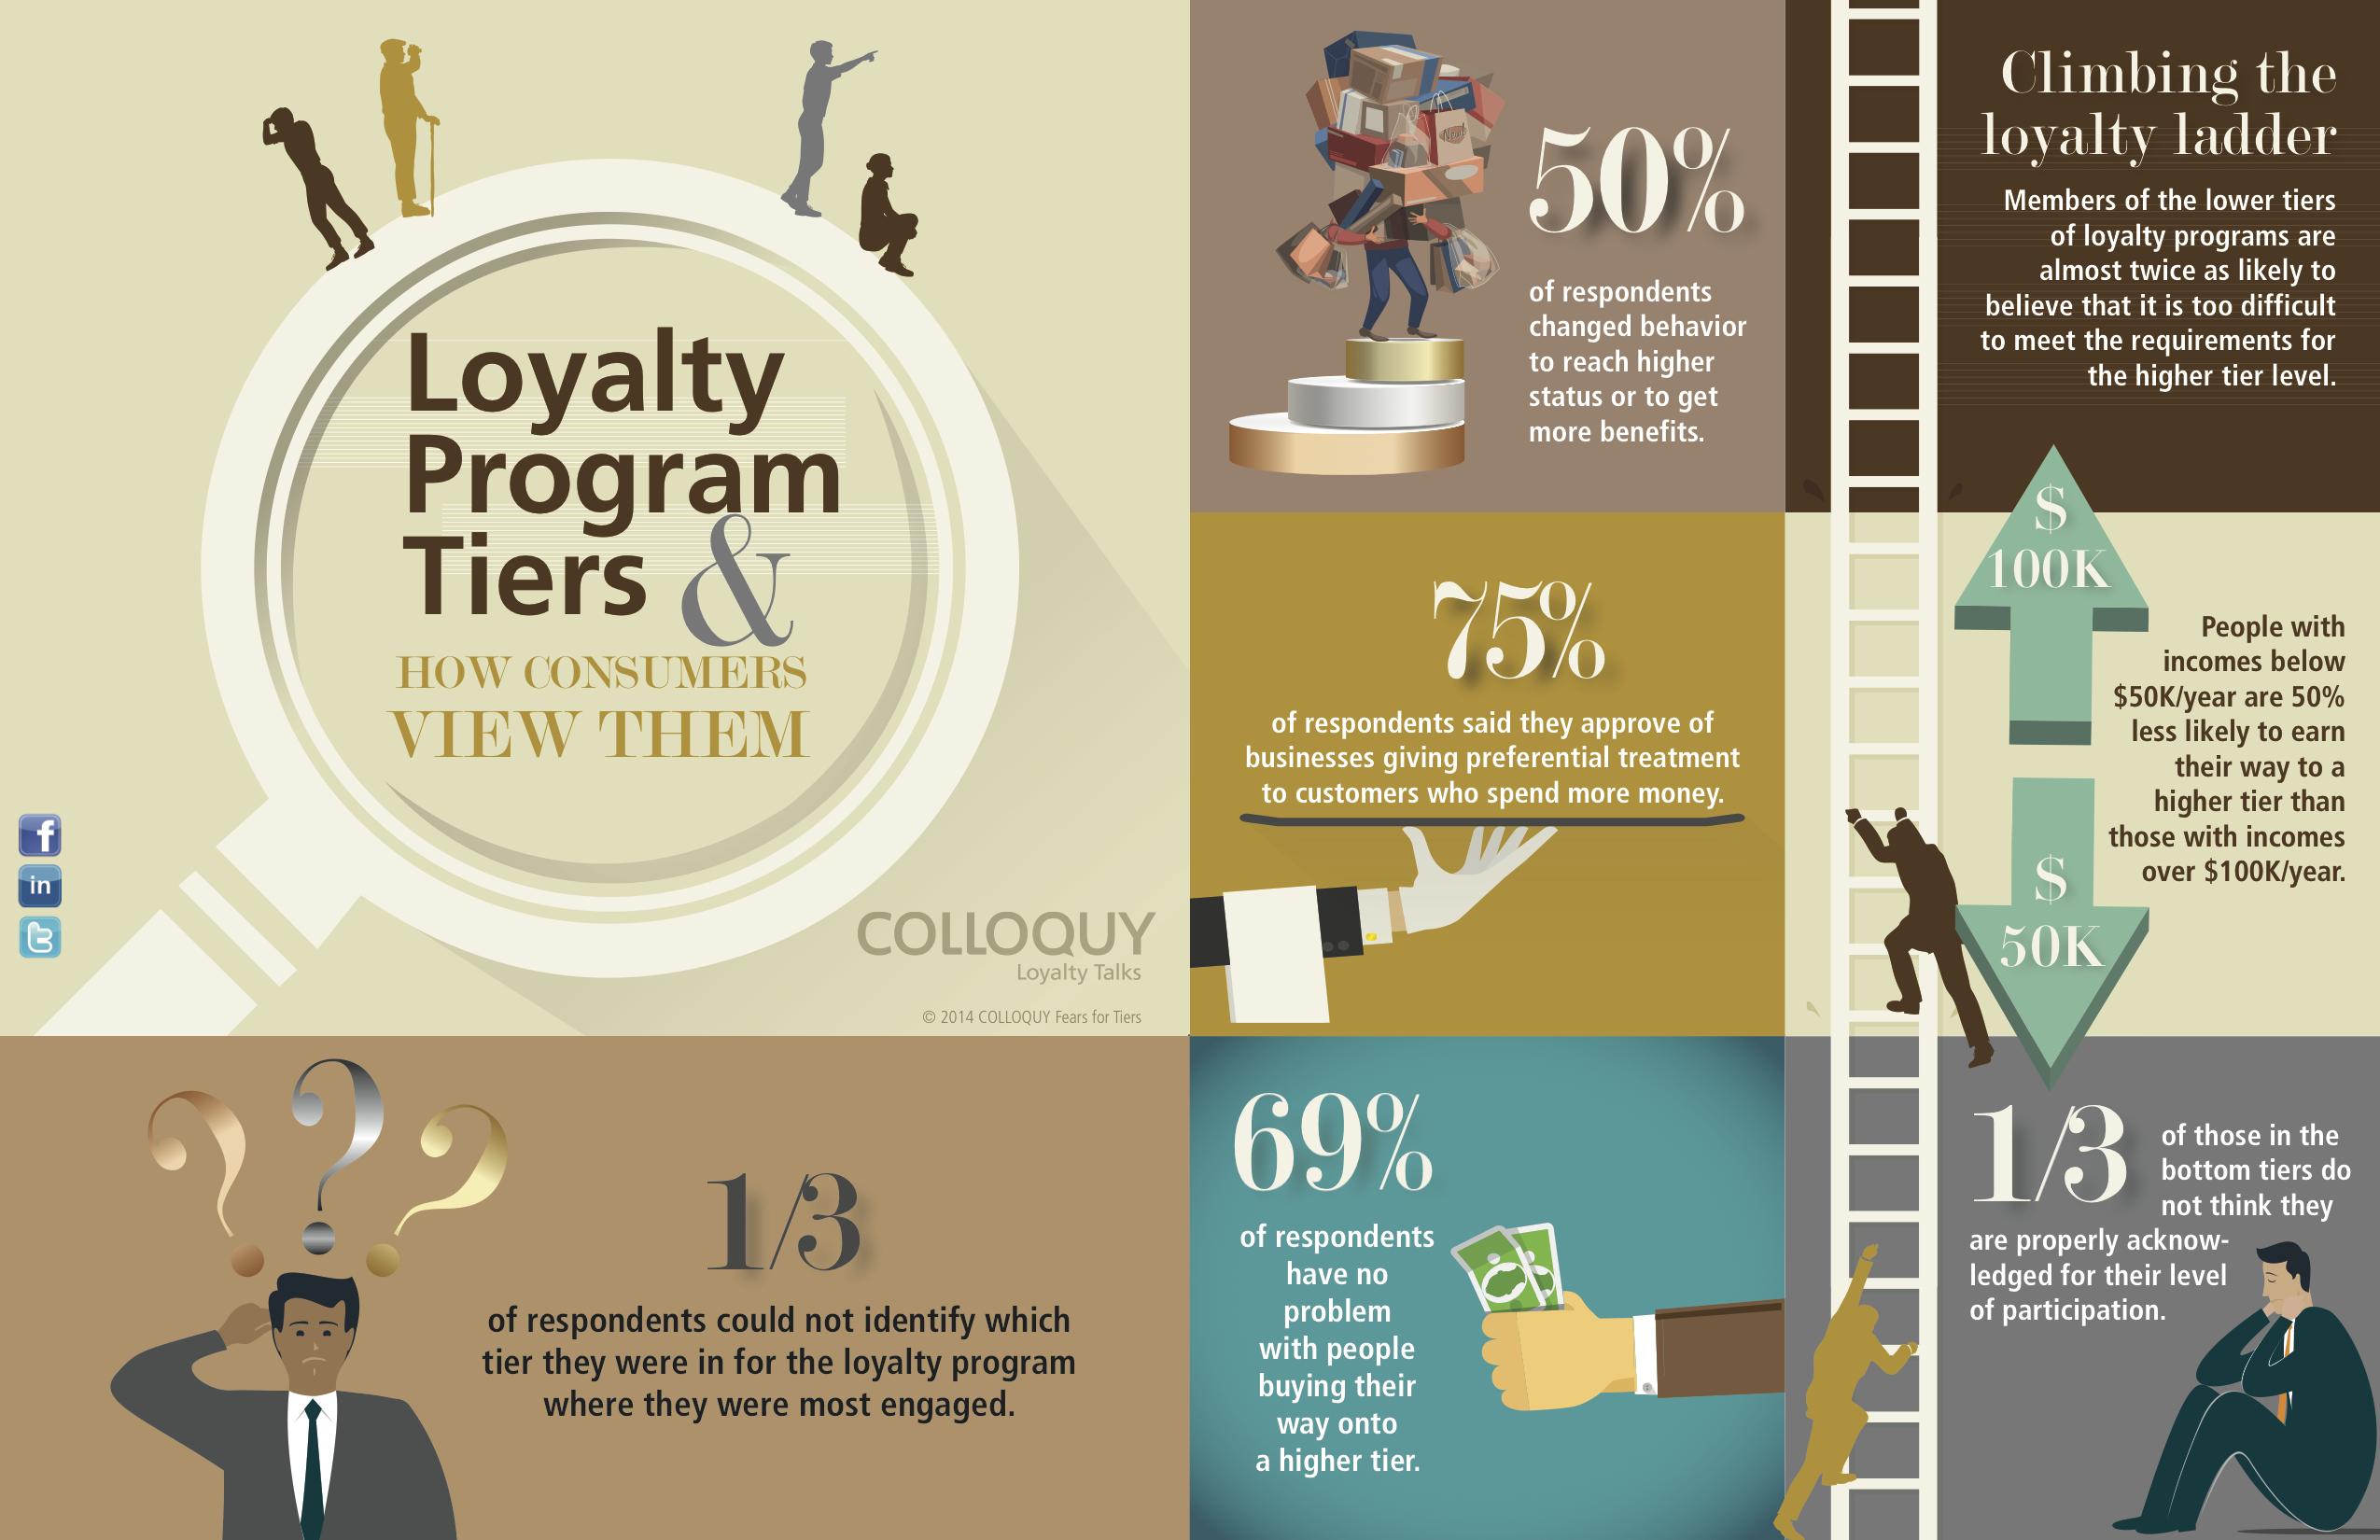 Loyalty Program Tiers